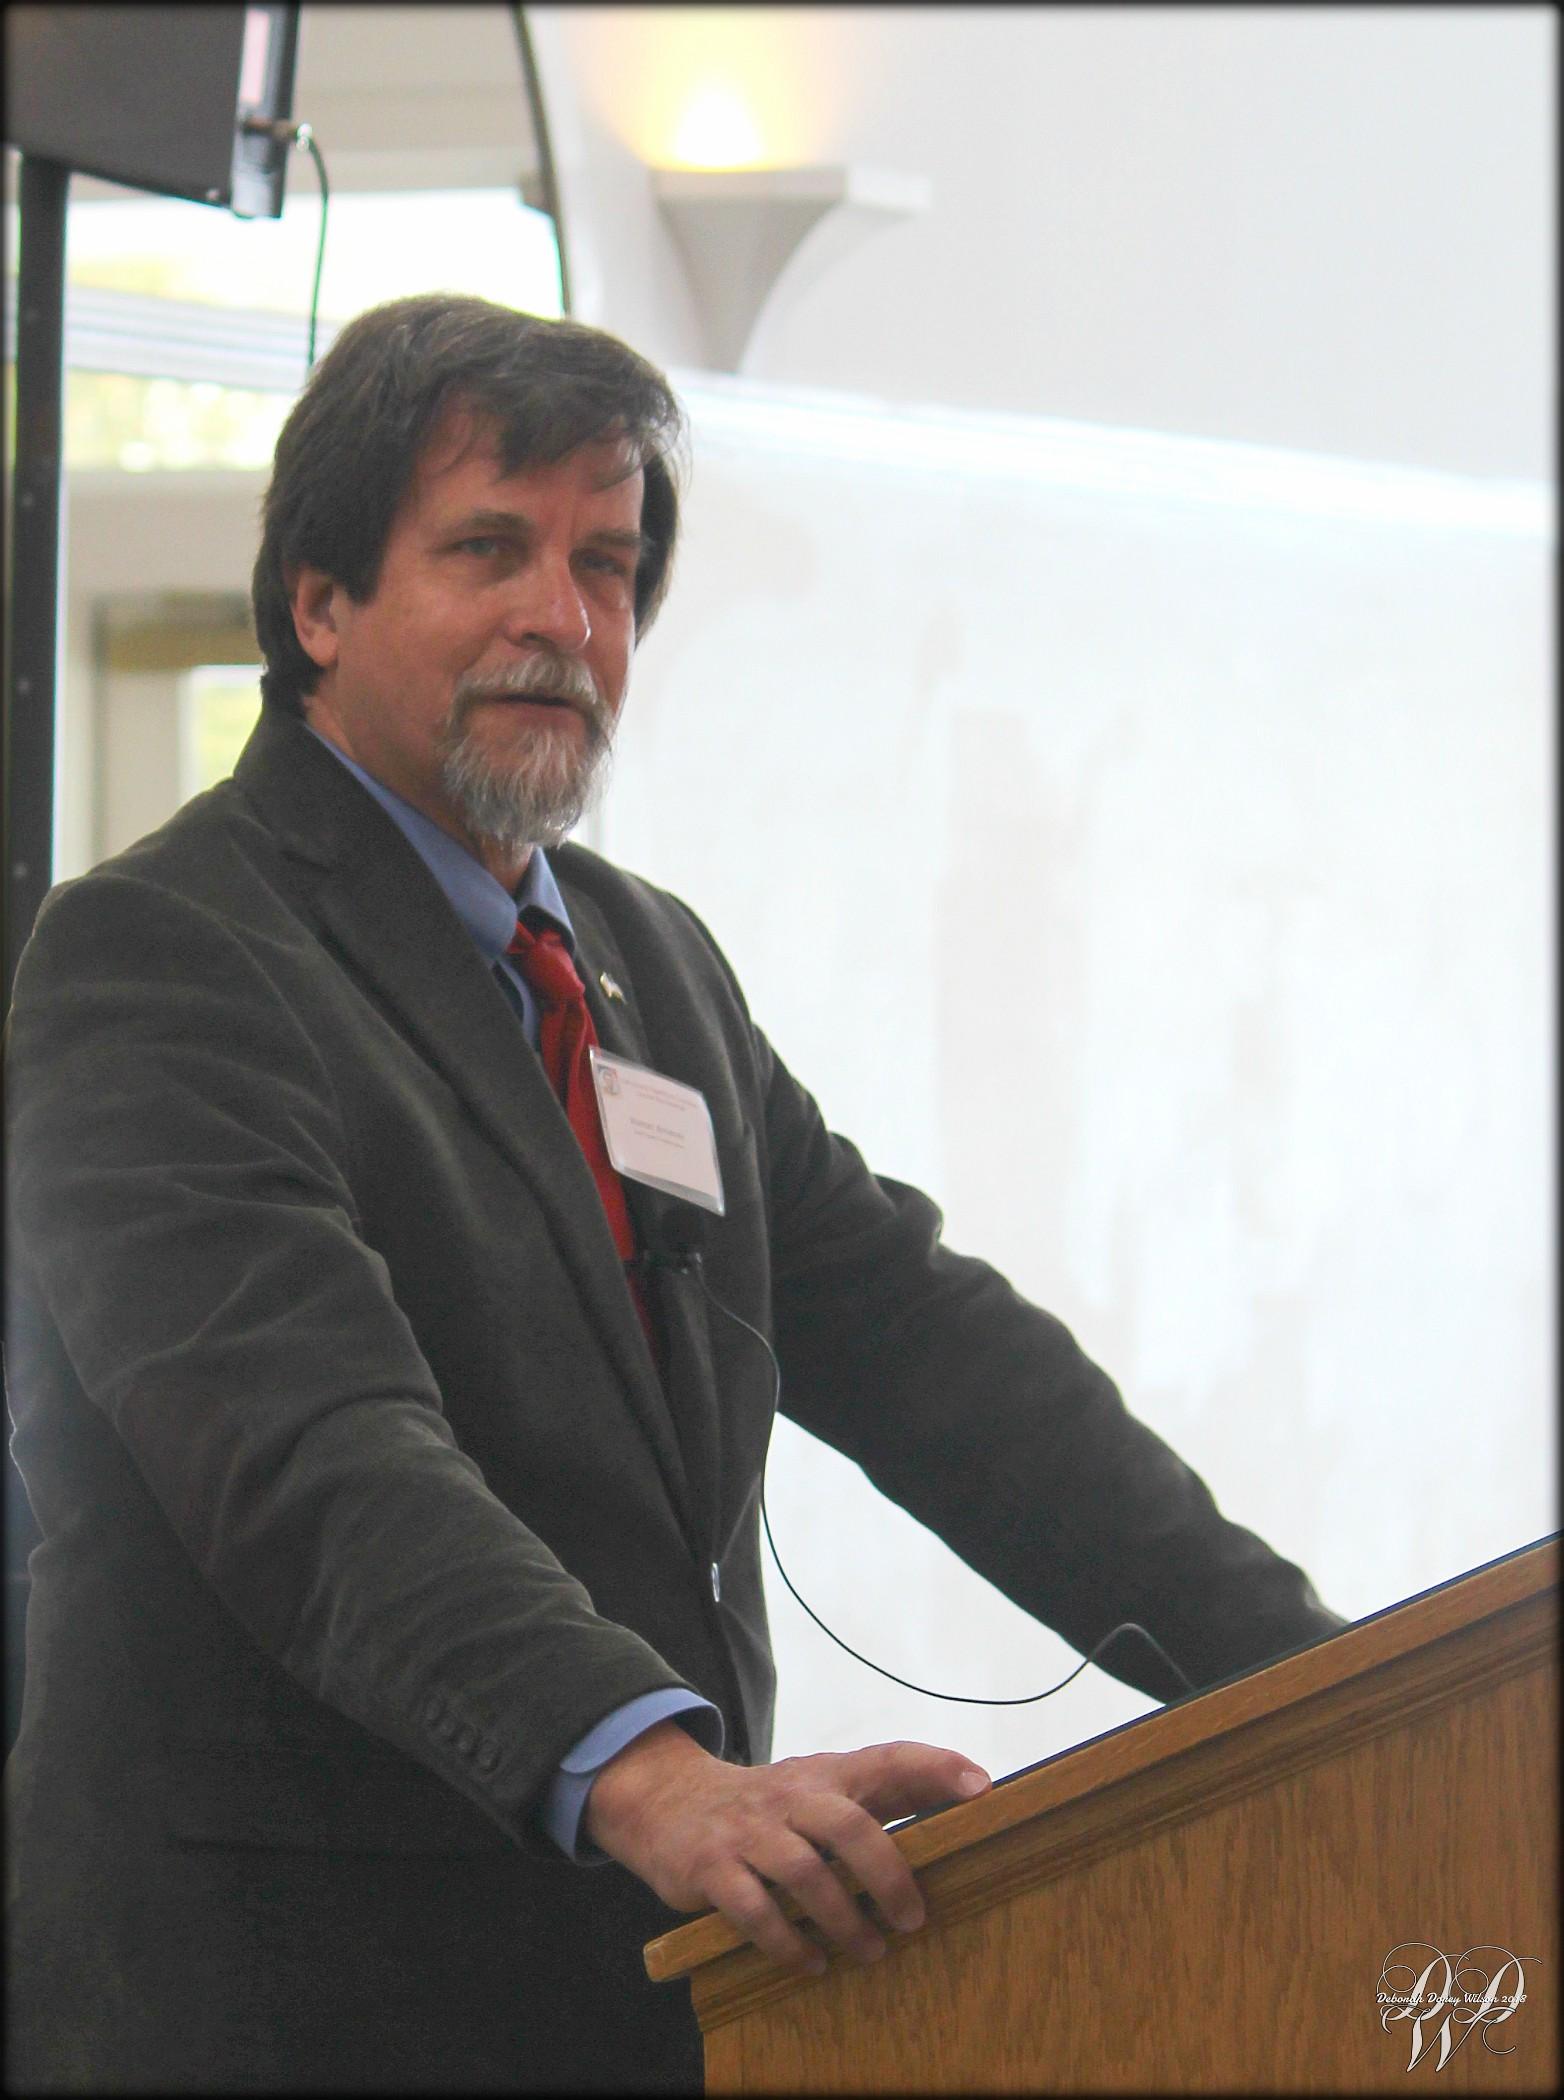 Pastor-Bob-Lebanons-County-Commissioner